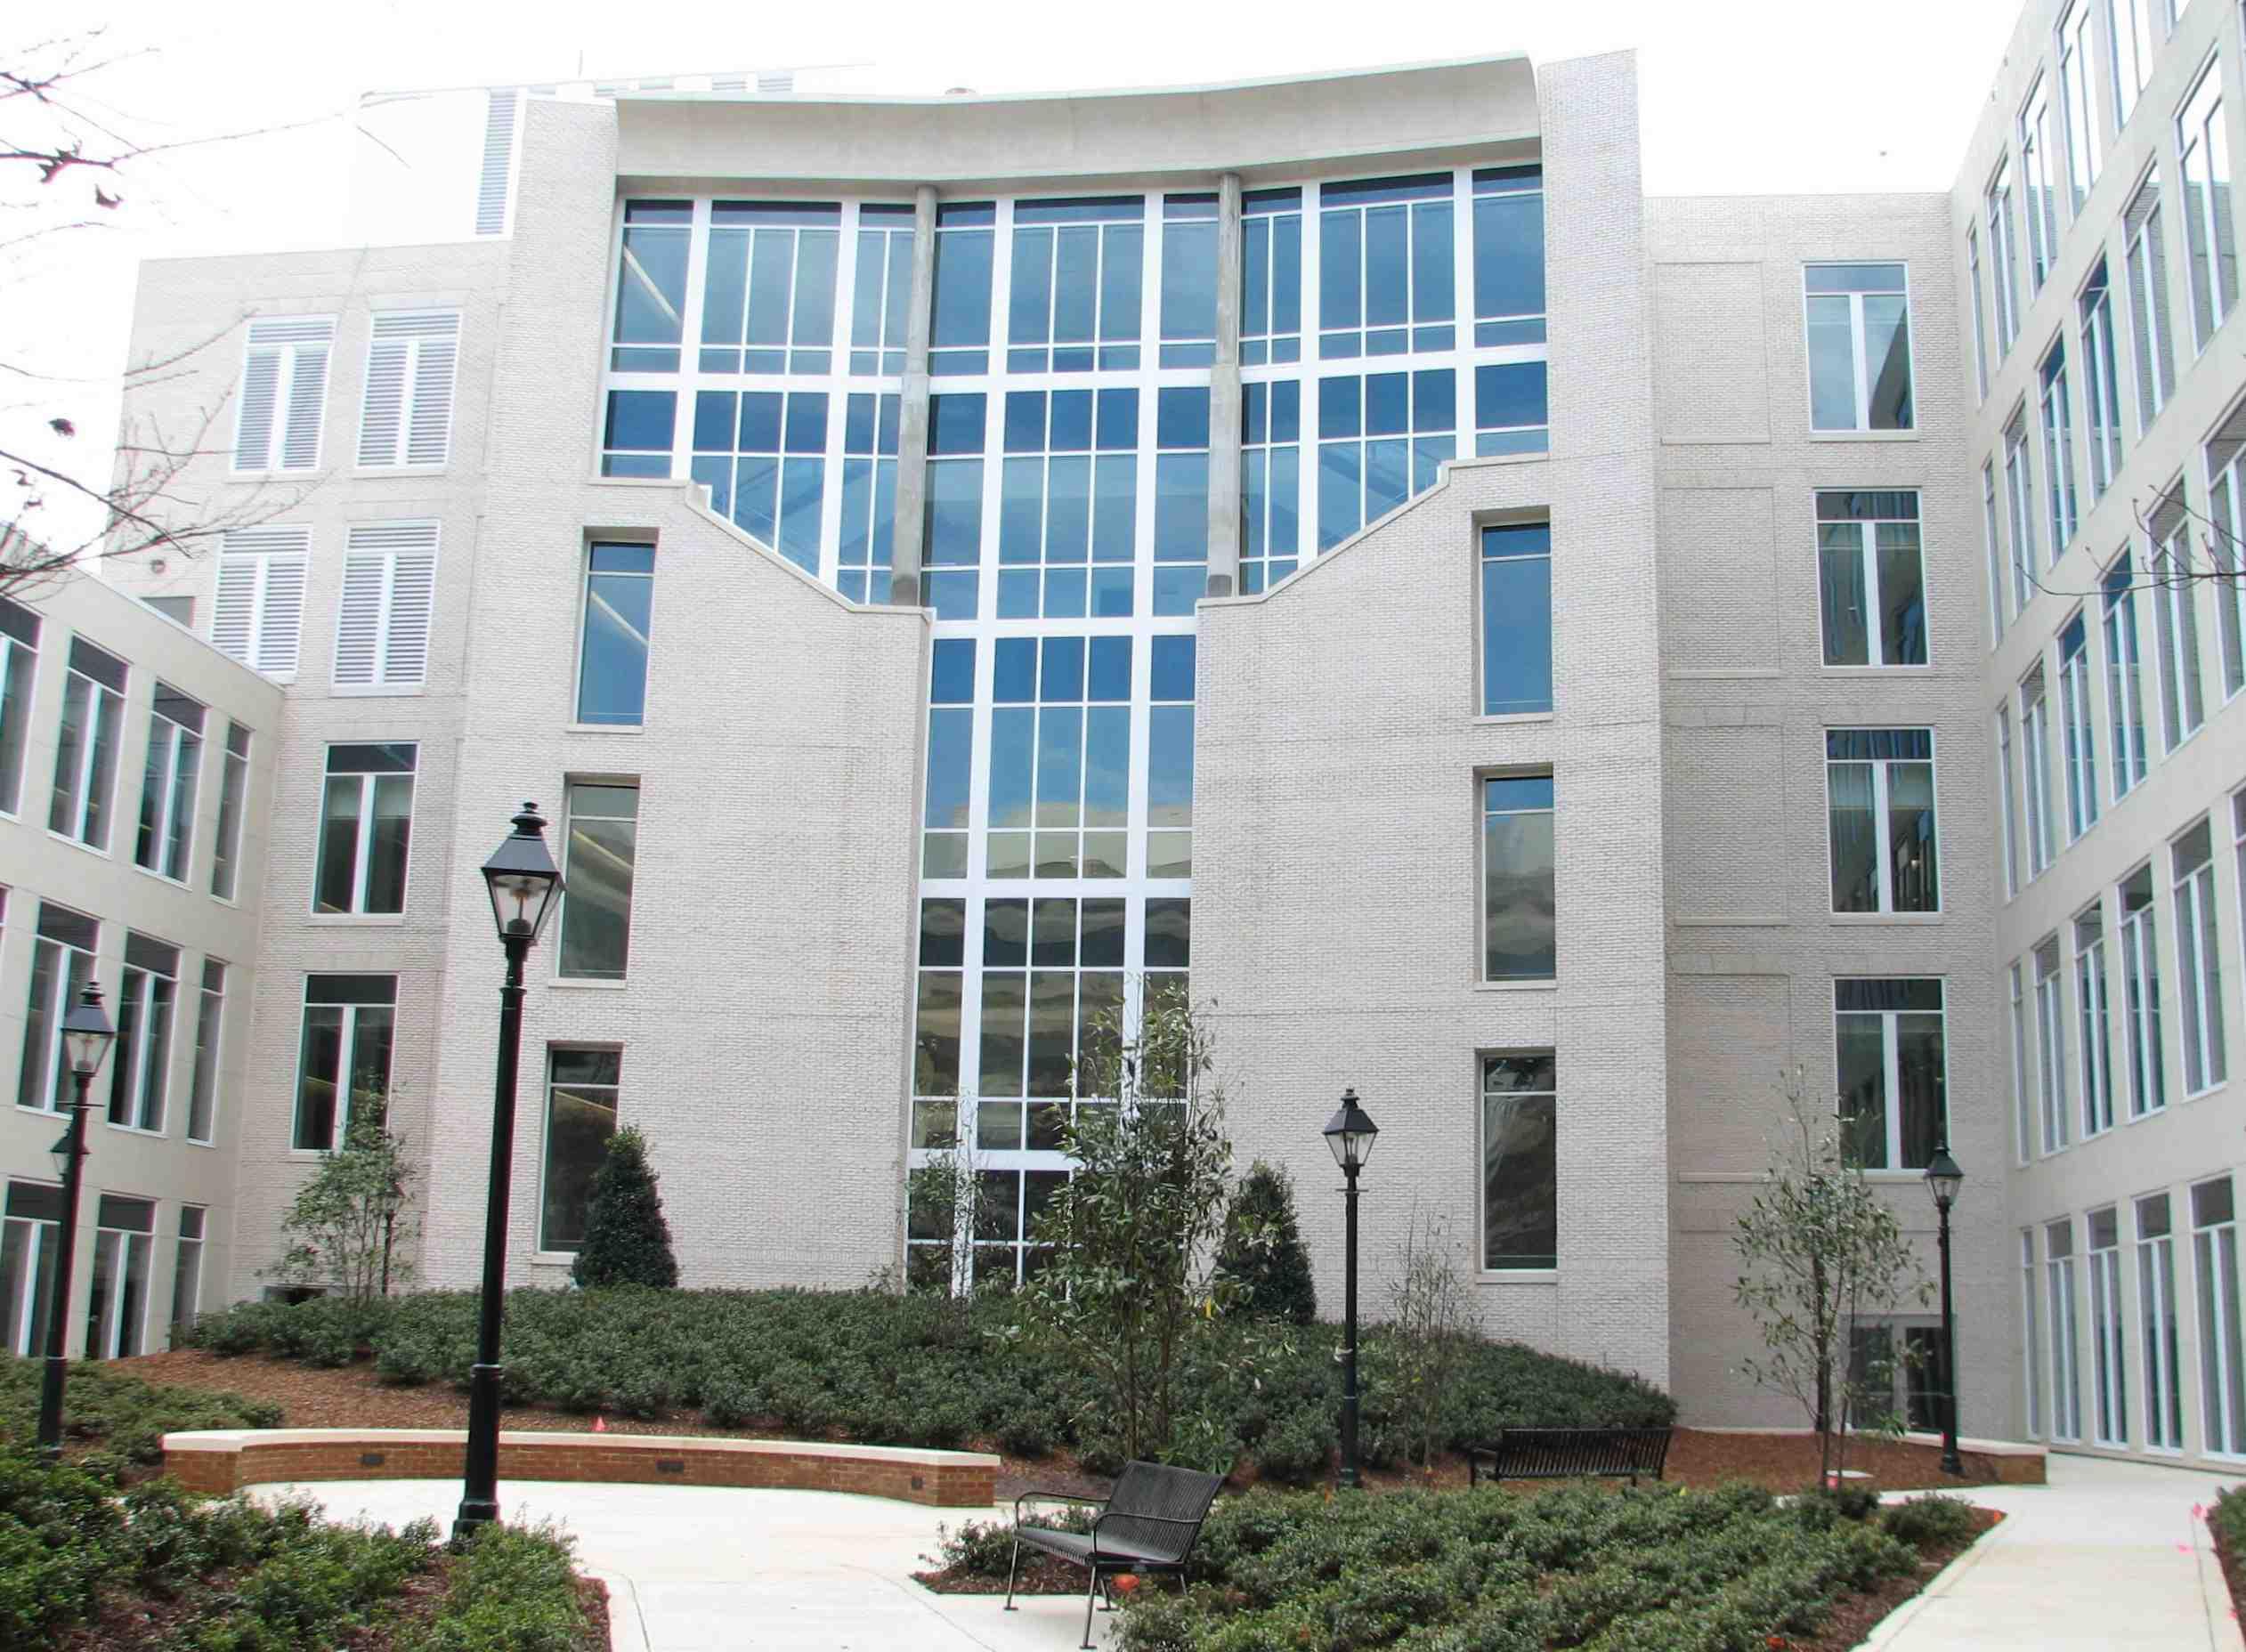 Fairfax County Courthouse